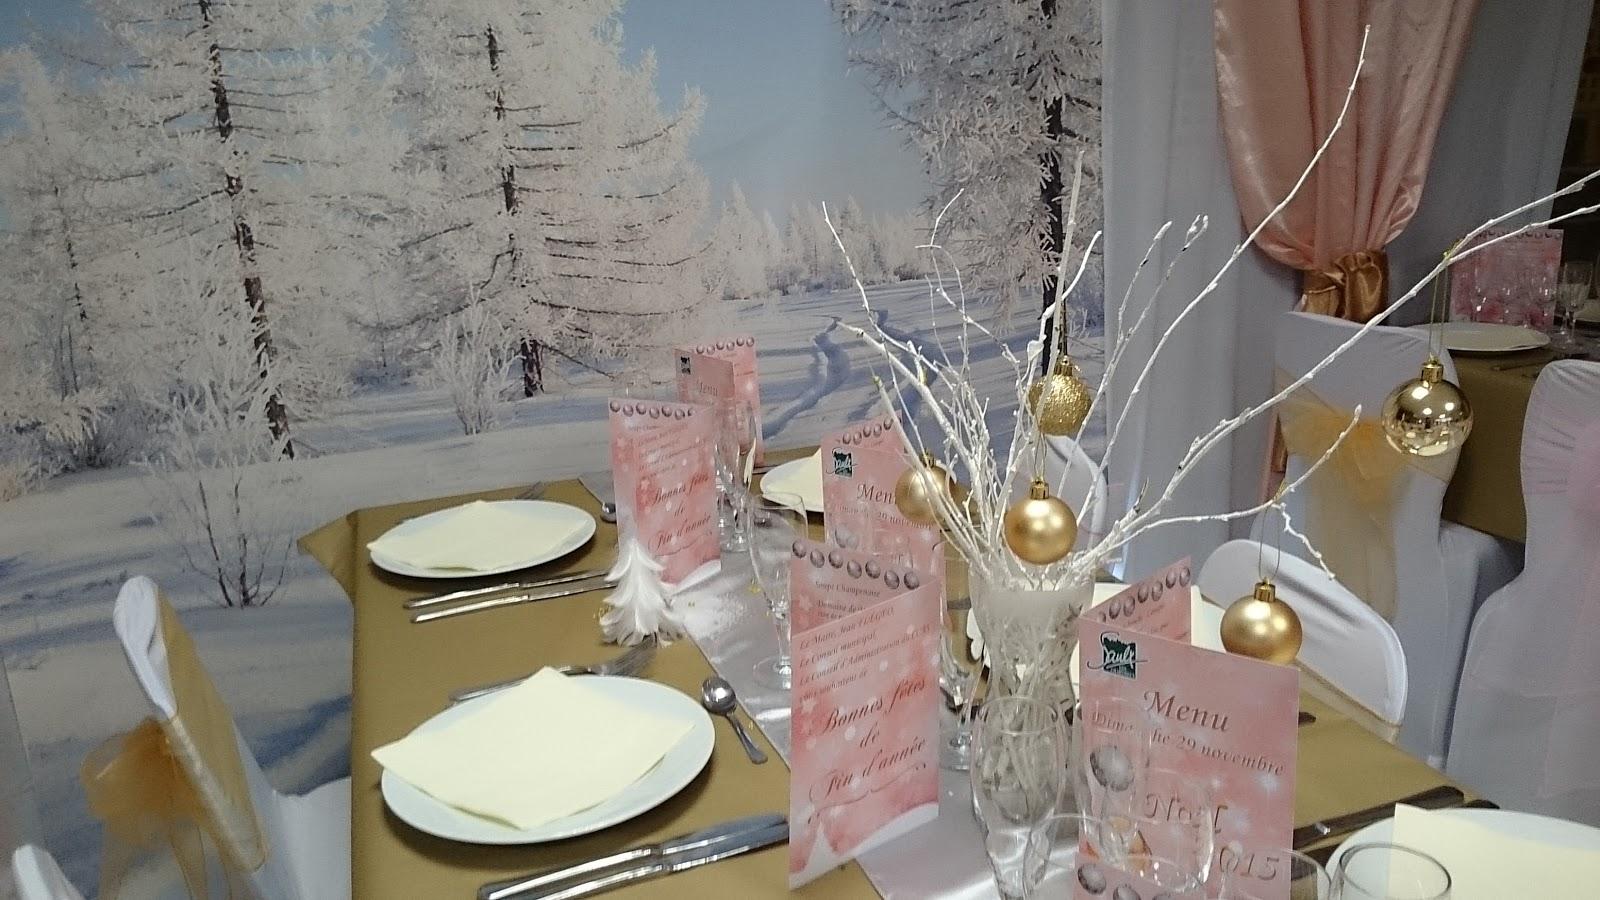 #654B3A Decor Noel Entreprises VITRINES NOEL: DECOR NOEL  5483 decorations de noel pour entreprise 1600x900 px @ aertt.com